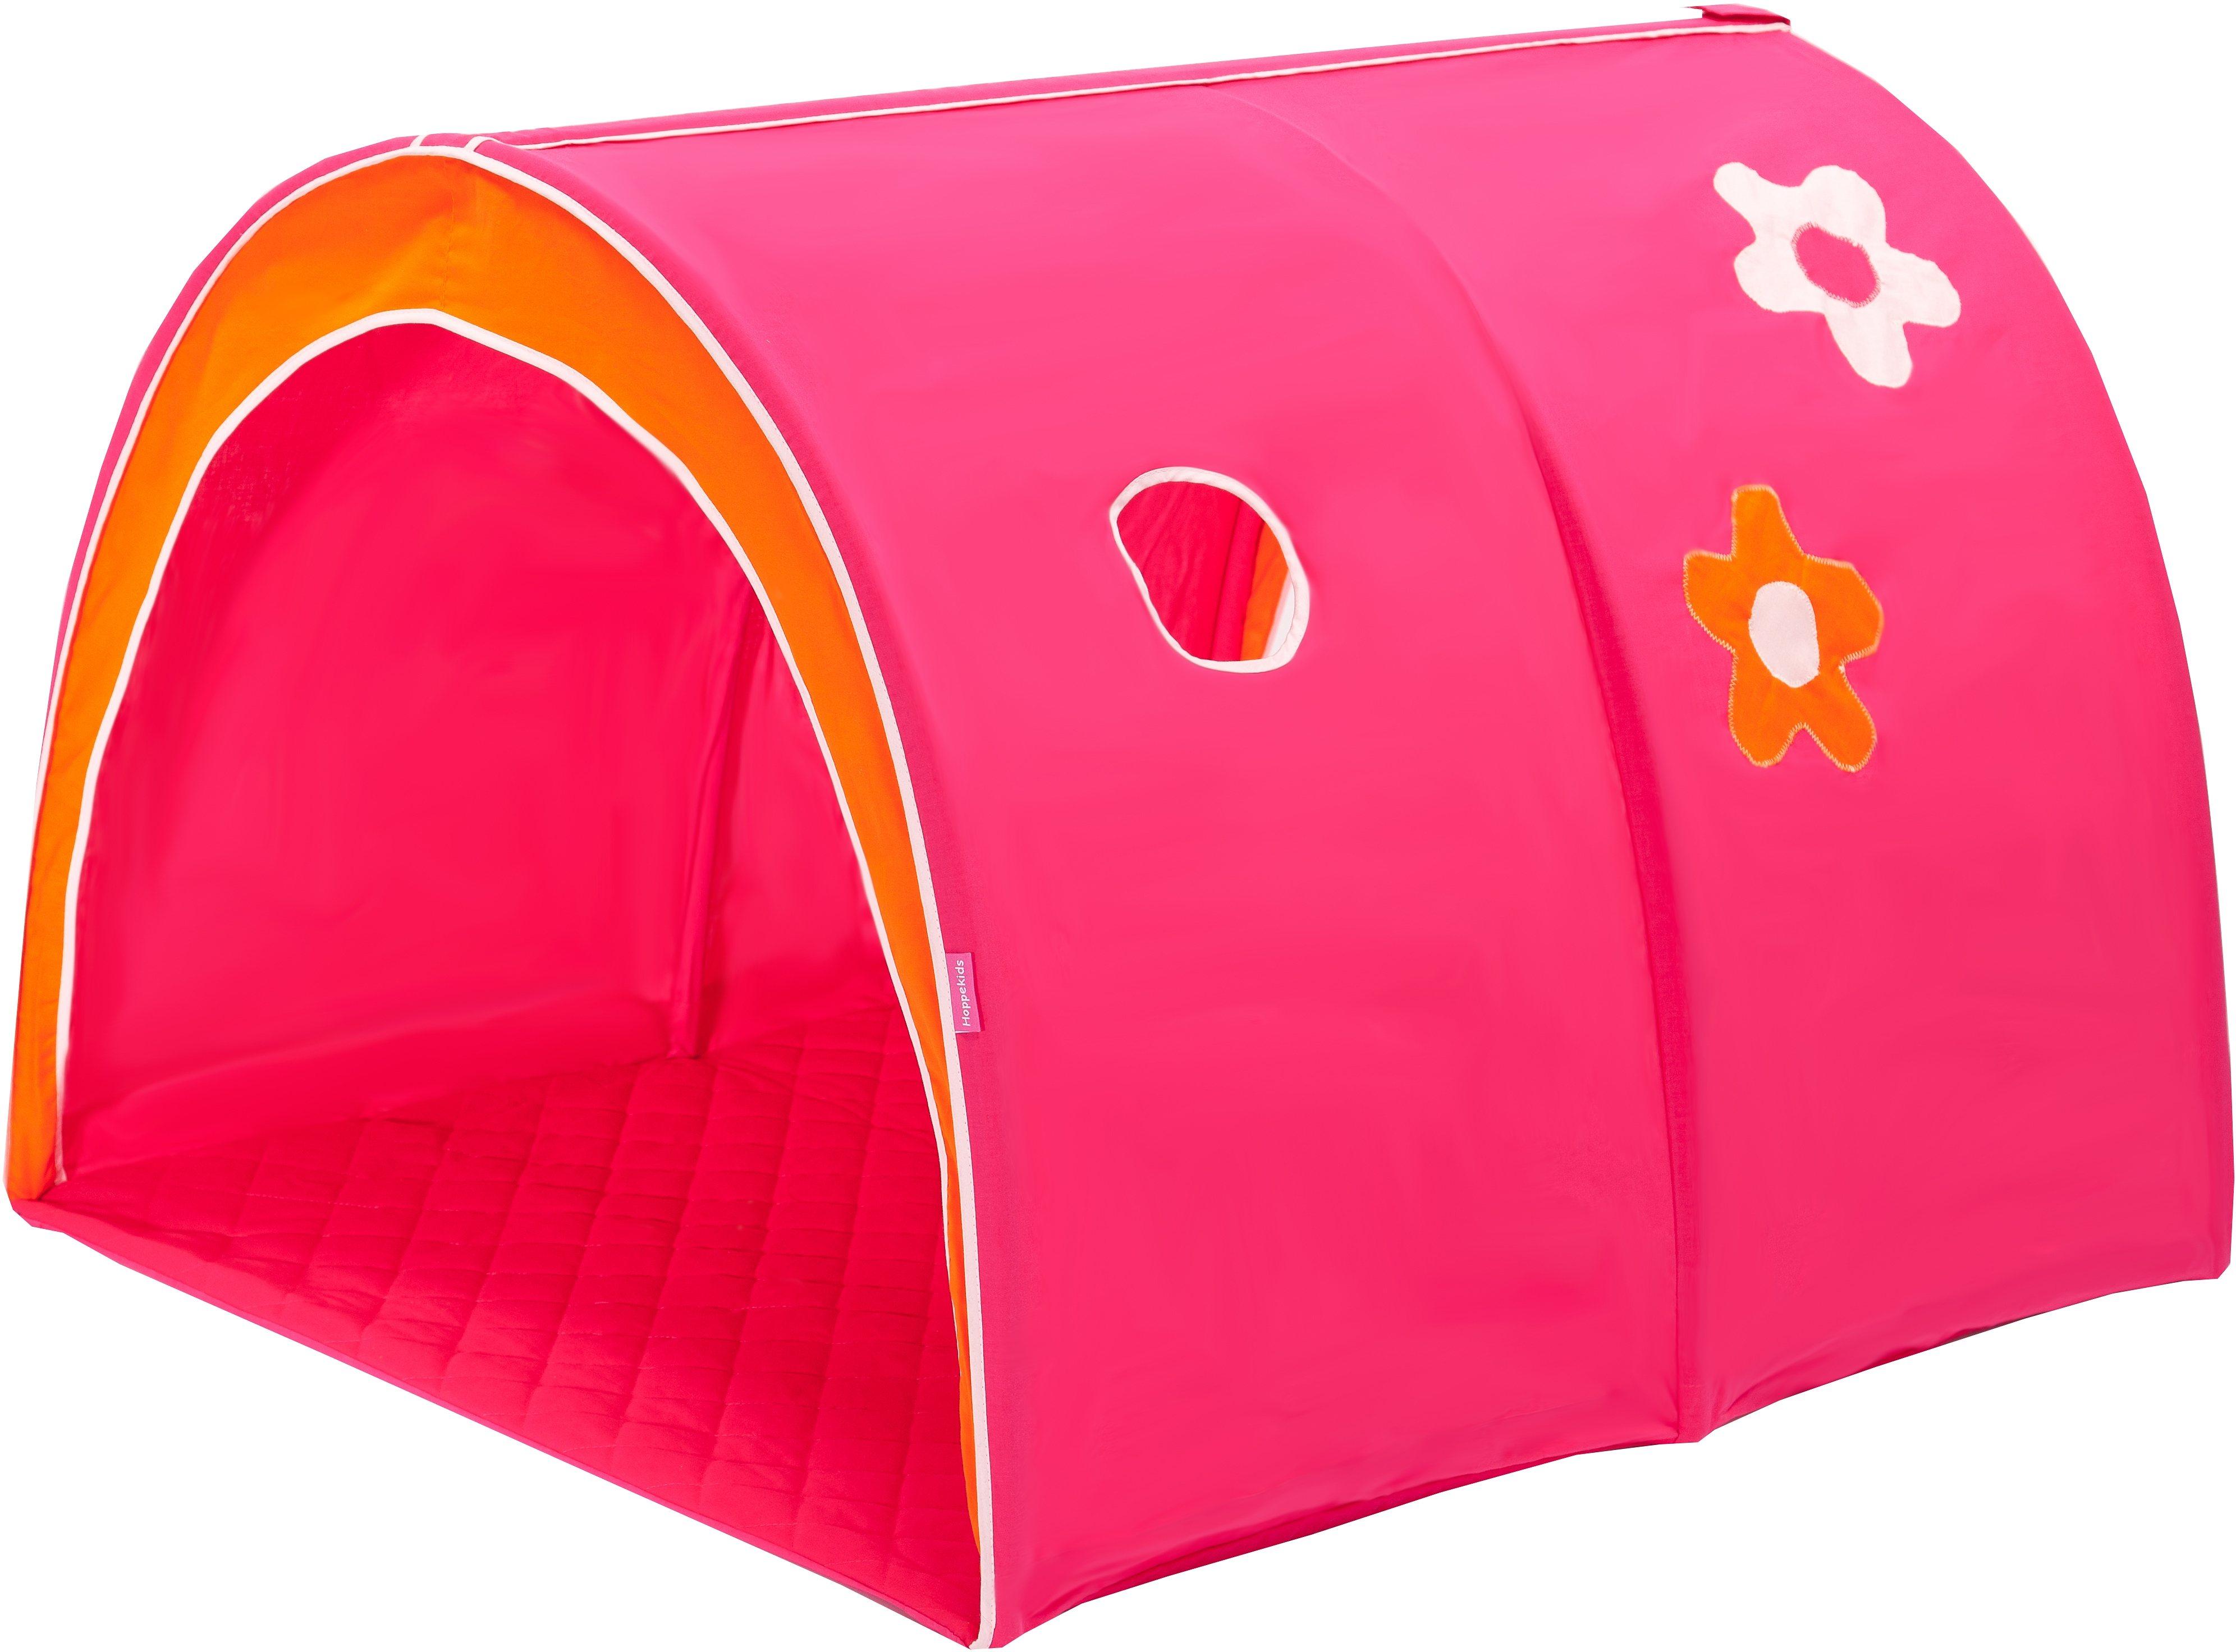 Hoppekids Tunnel »Flowerpower«   Kinderzimmer > Kinderbetten > Baldachine & Tunnels   Stoff   Hoppekids